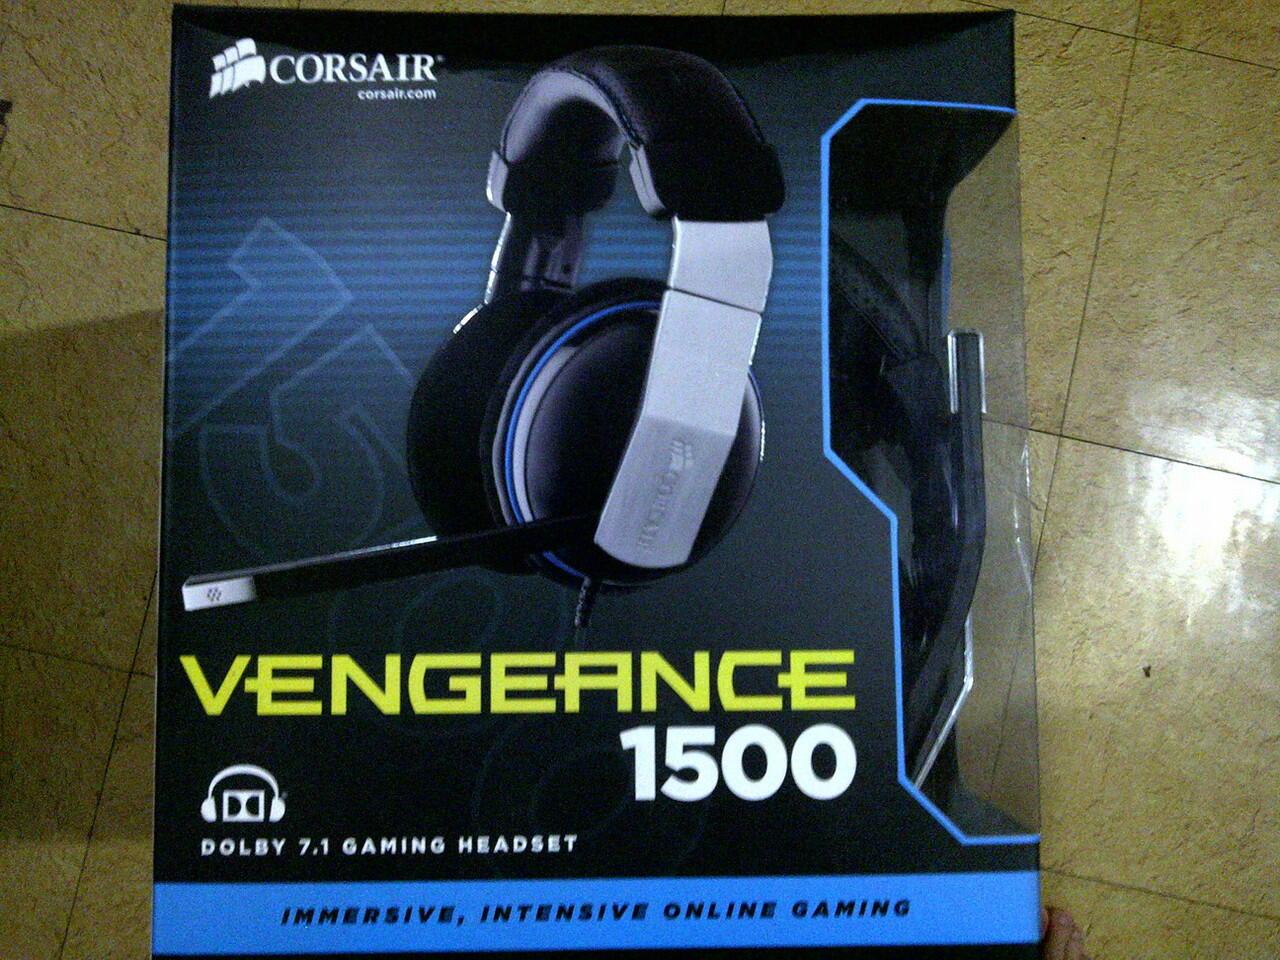 [WTS] Corsair Vengeance 1500 7.1 Gaming Headset